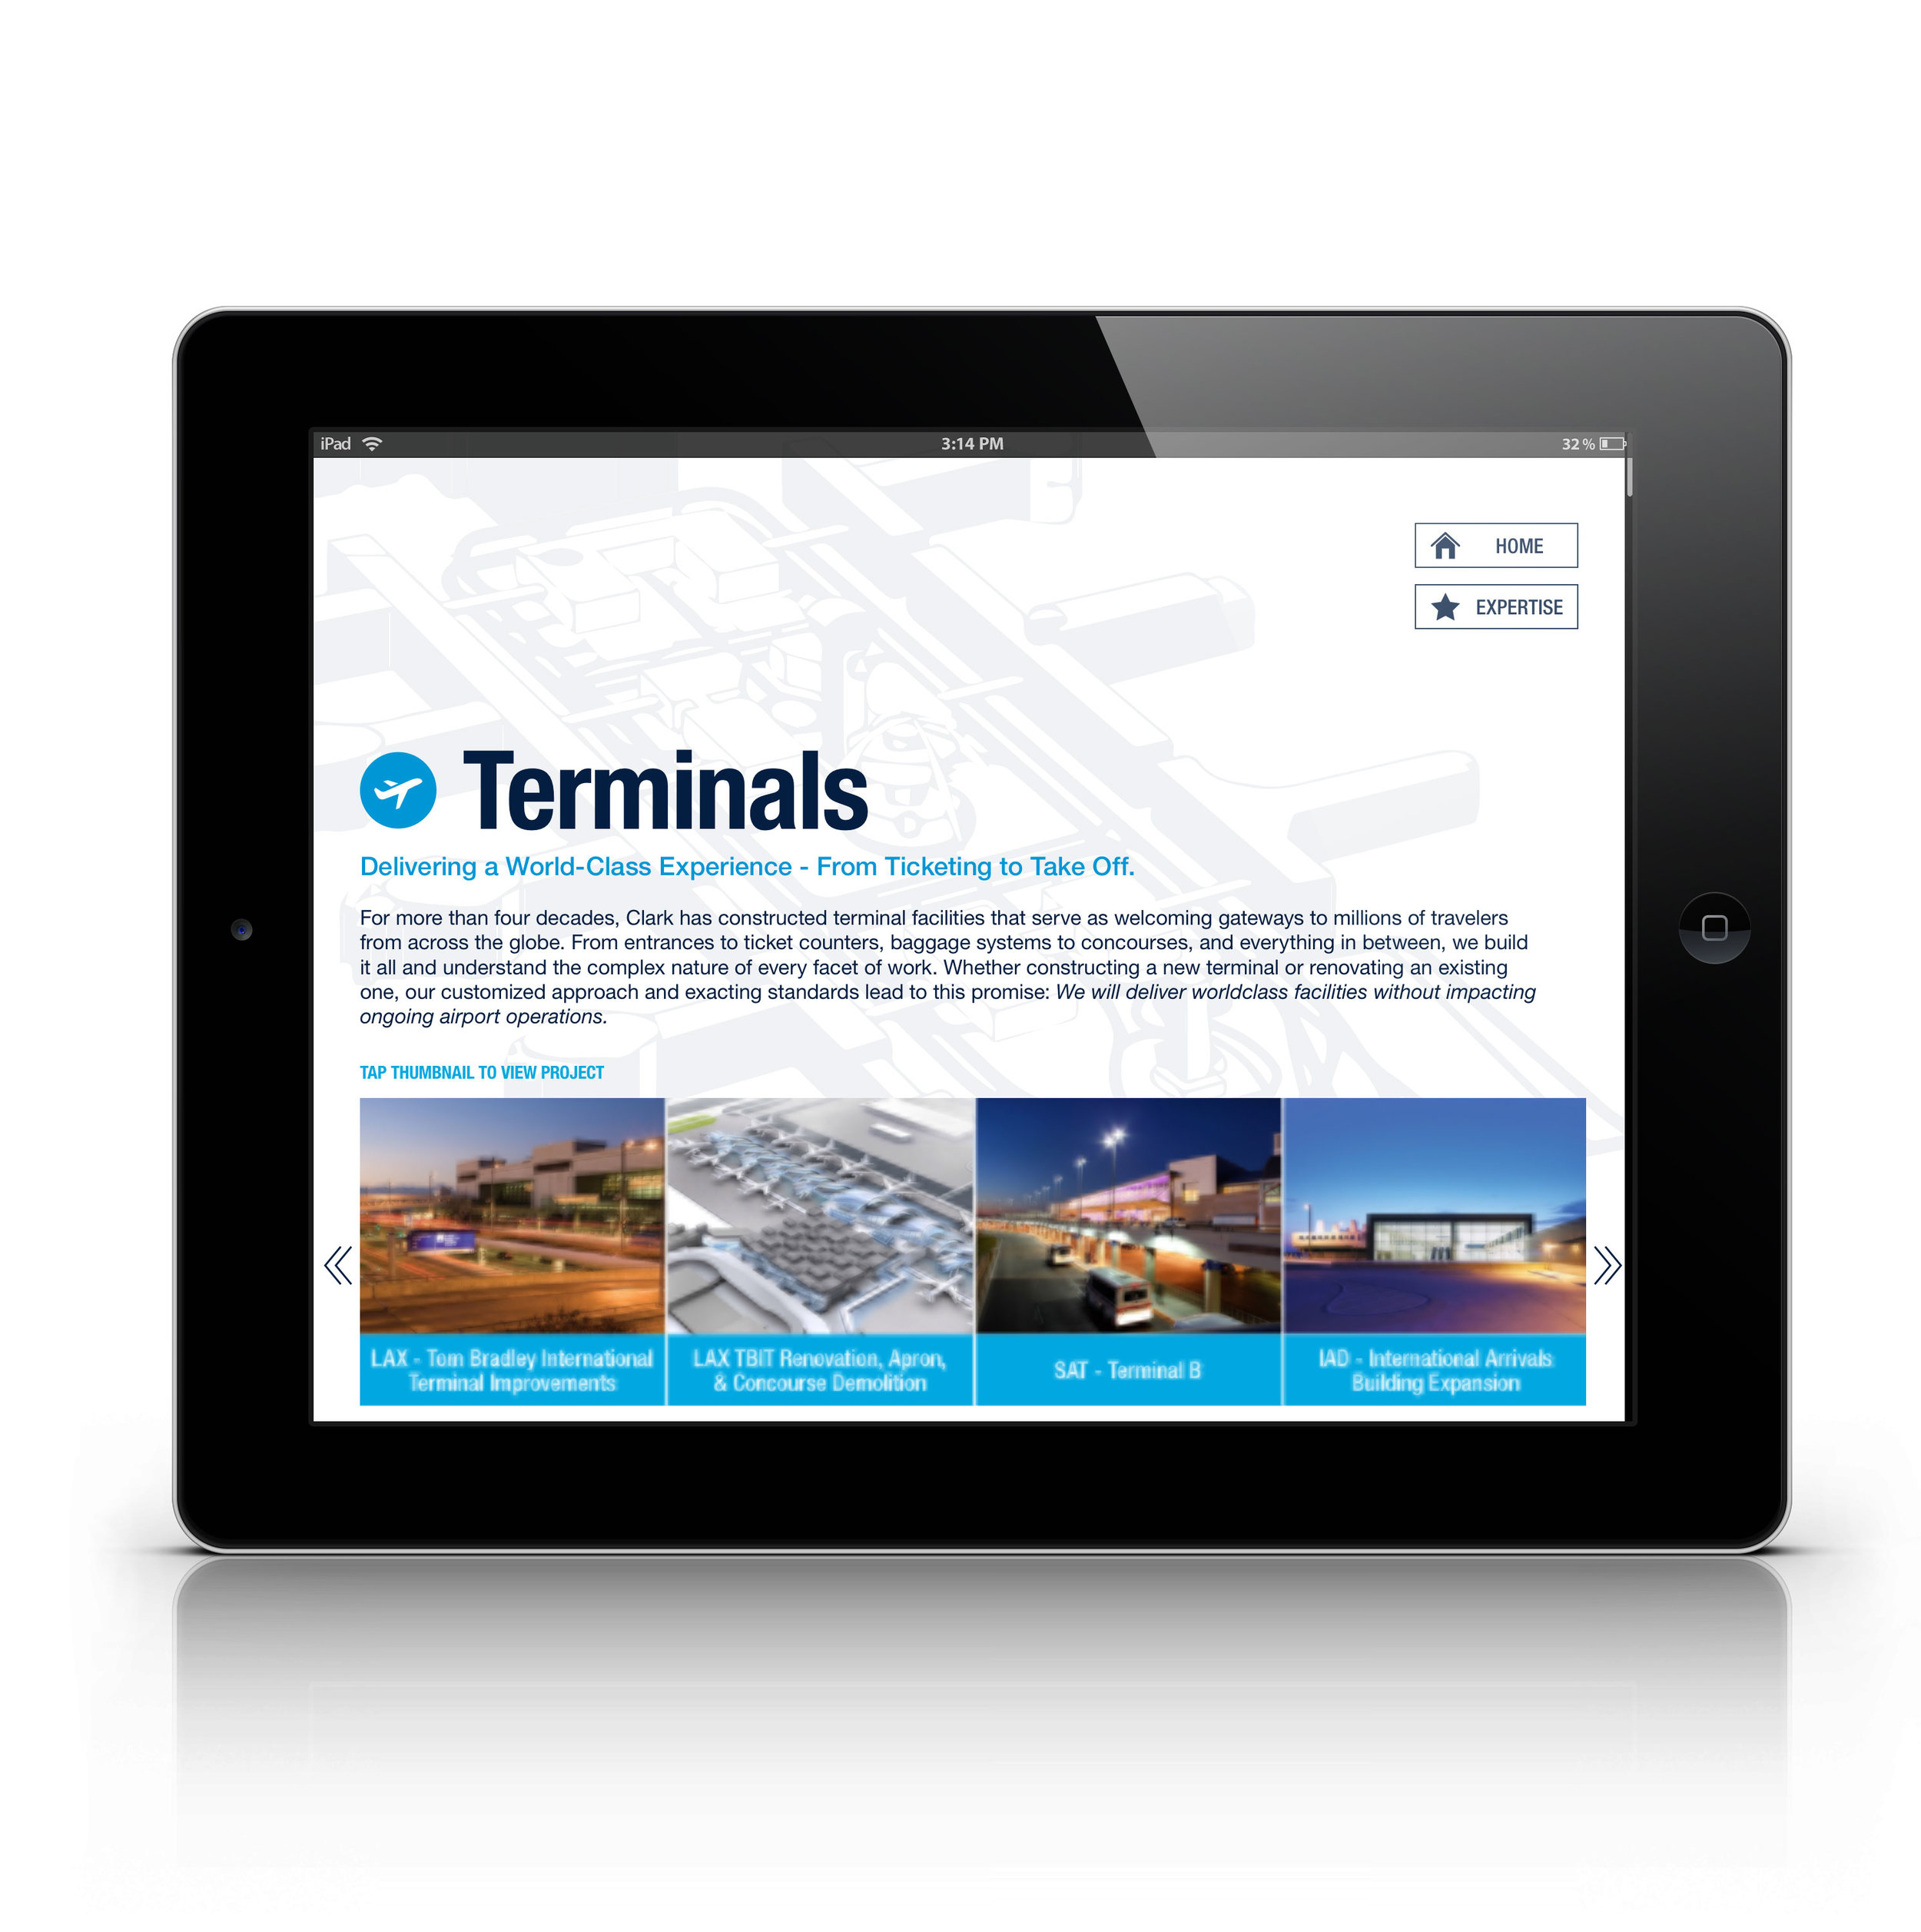 2clark-iPad-Landscape-Retina-Display-Mockup.jpg